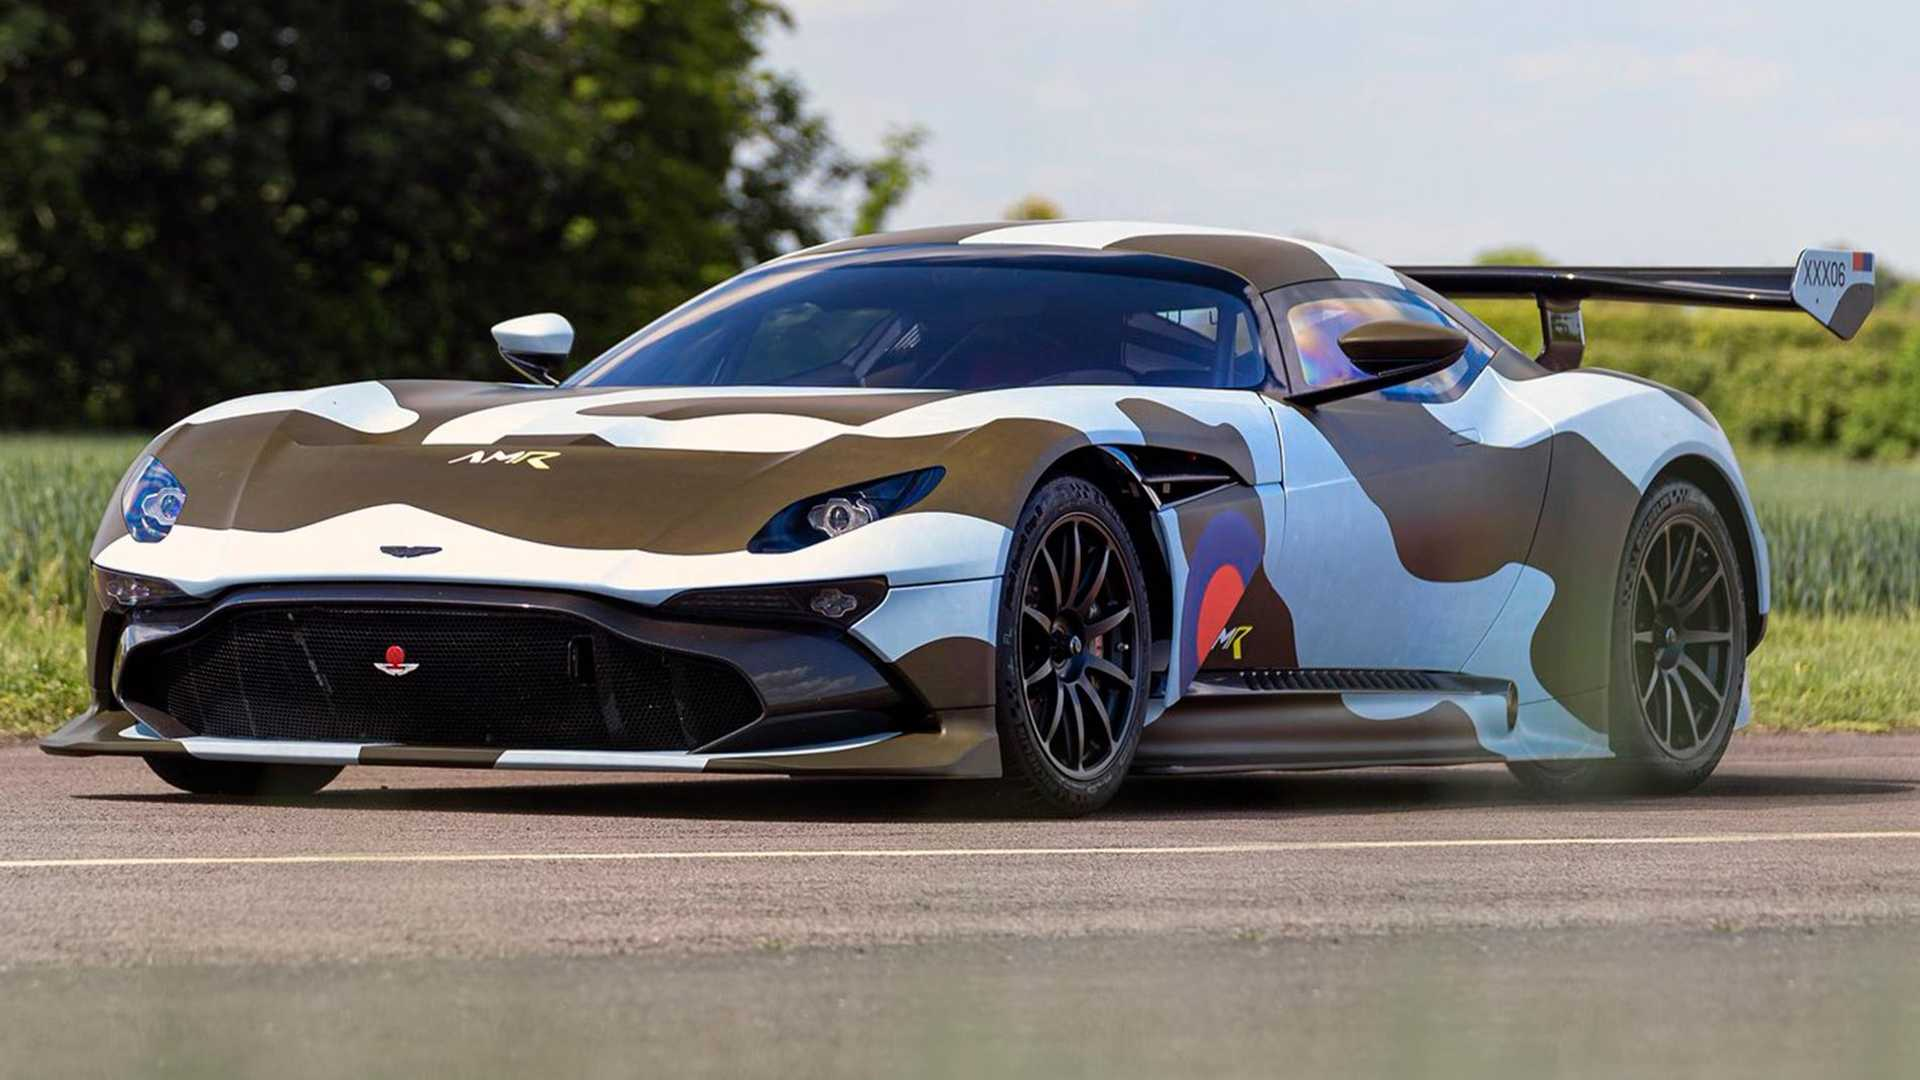 Aston Martin Vulcan Bomber Readies For Gumball 3000